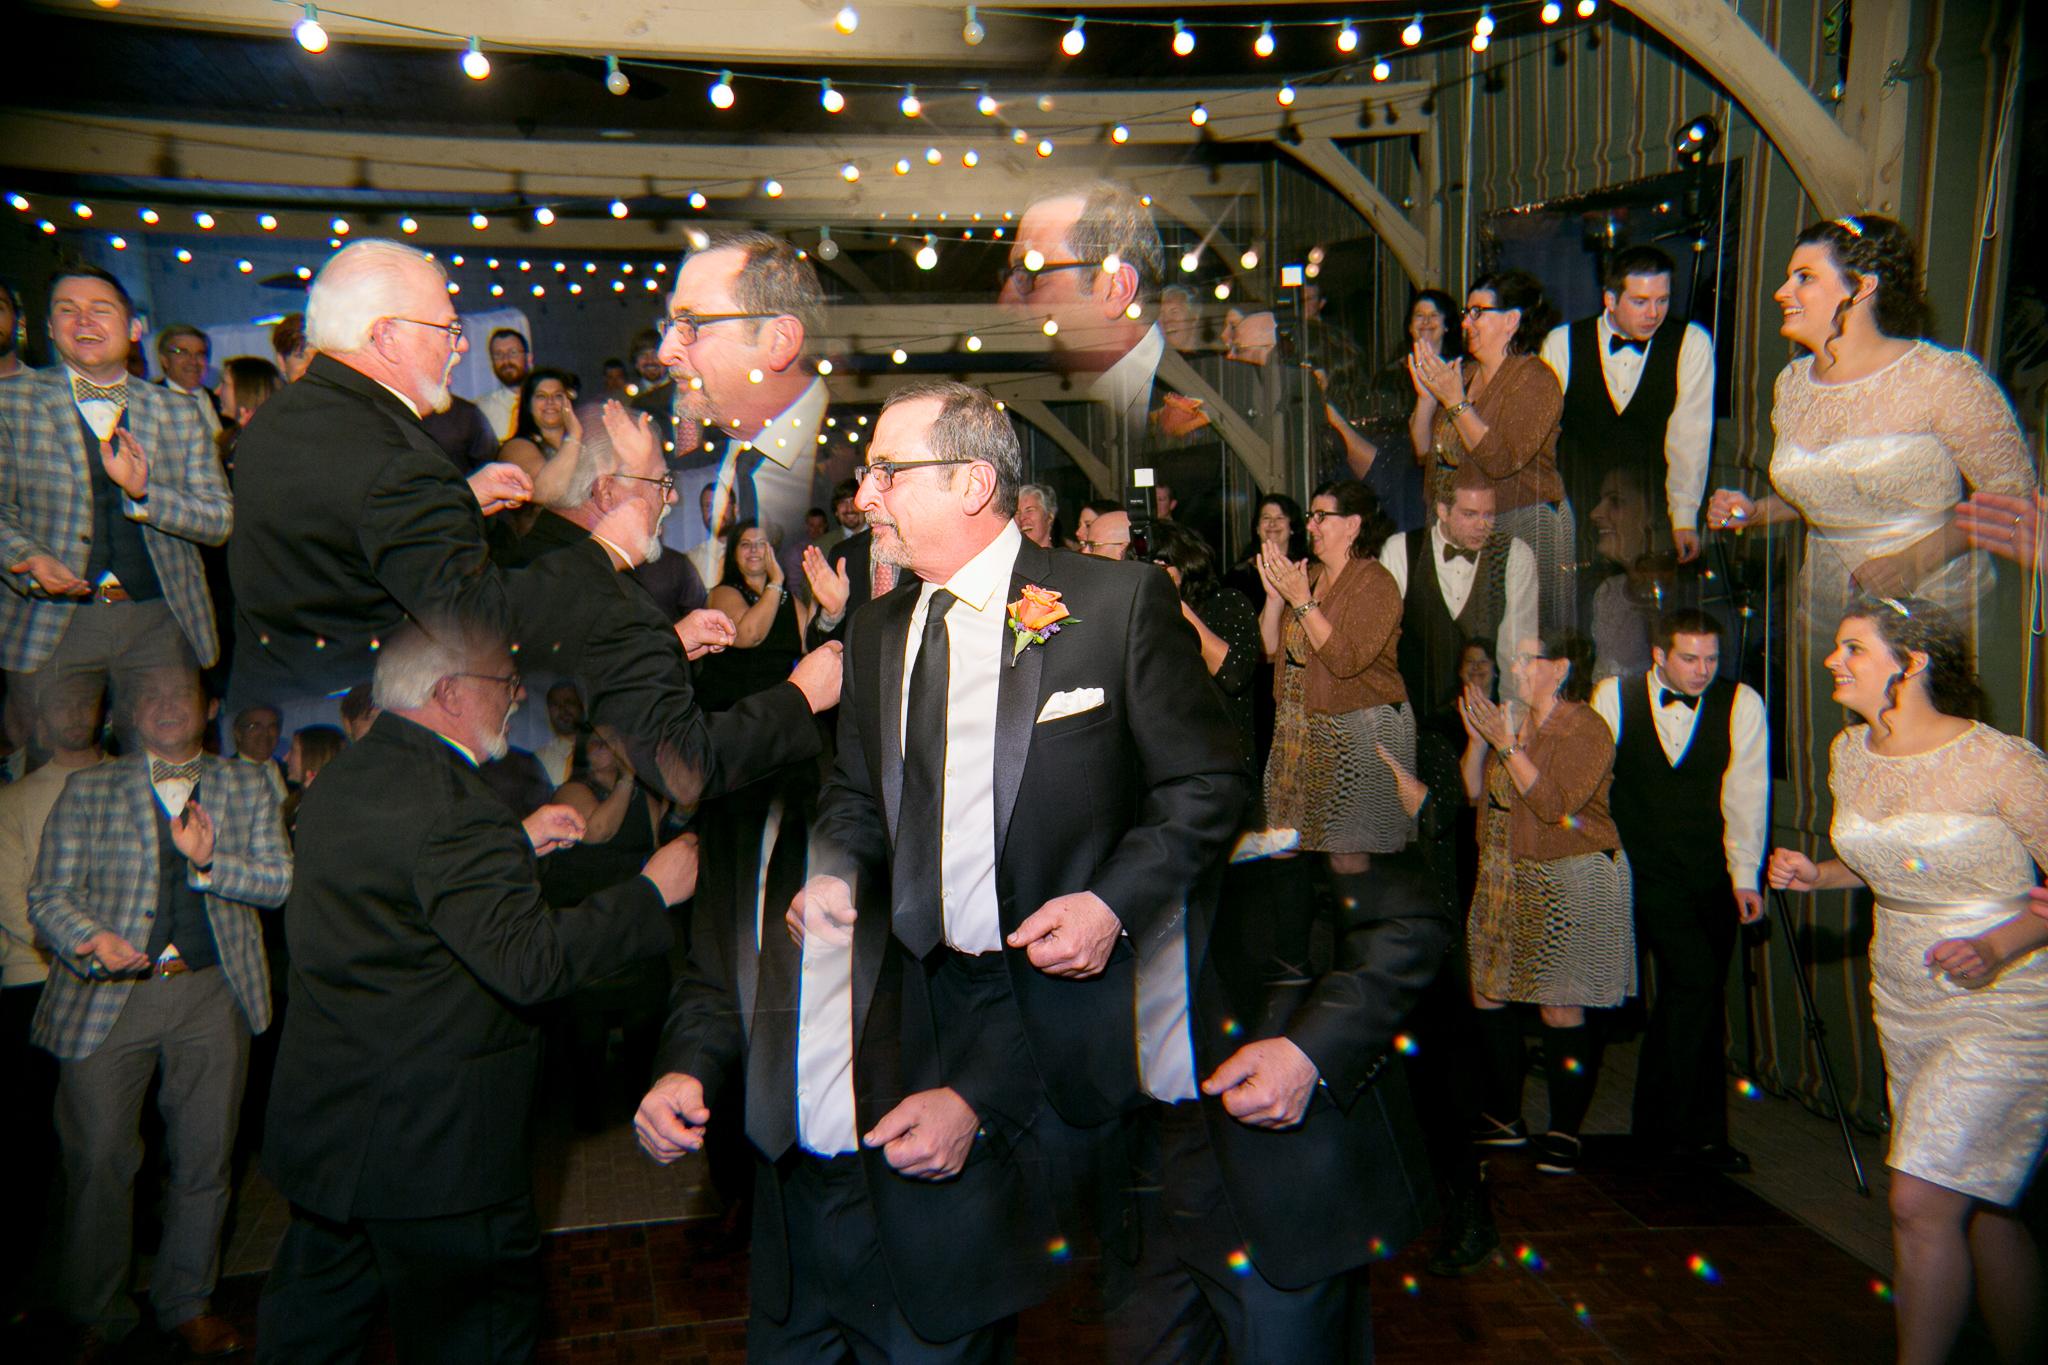 camuglia-whomstudio-chelsea_and_andy-nycphotographer-wedding-brooklyn-buffalo-timberlodge-146-5674.jpg